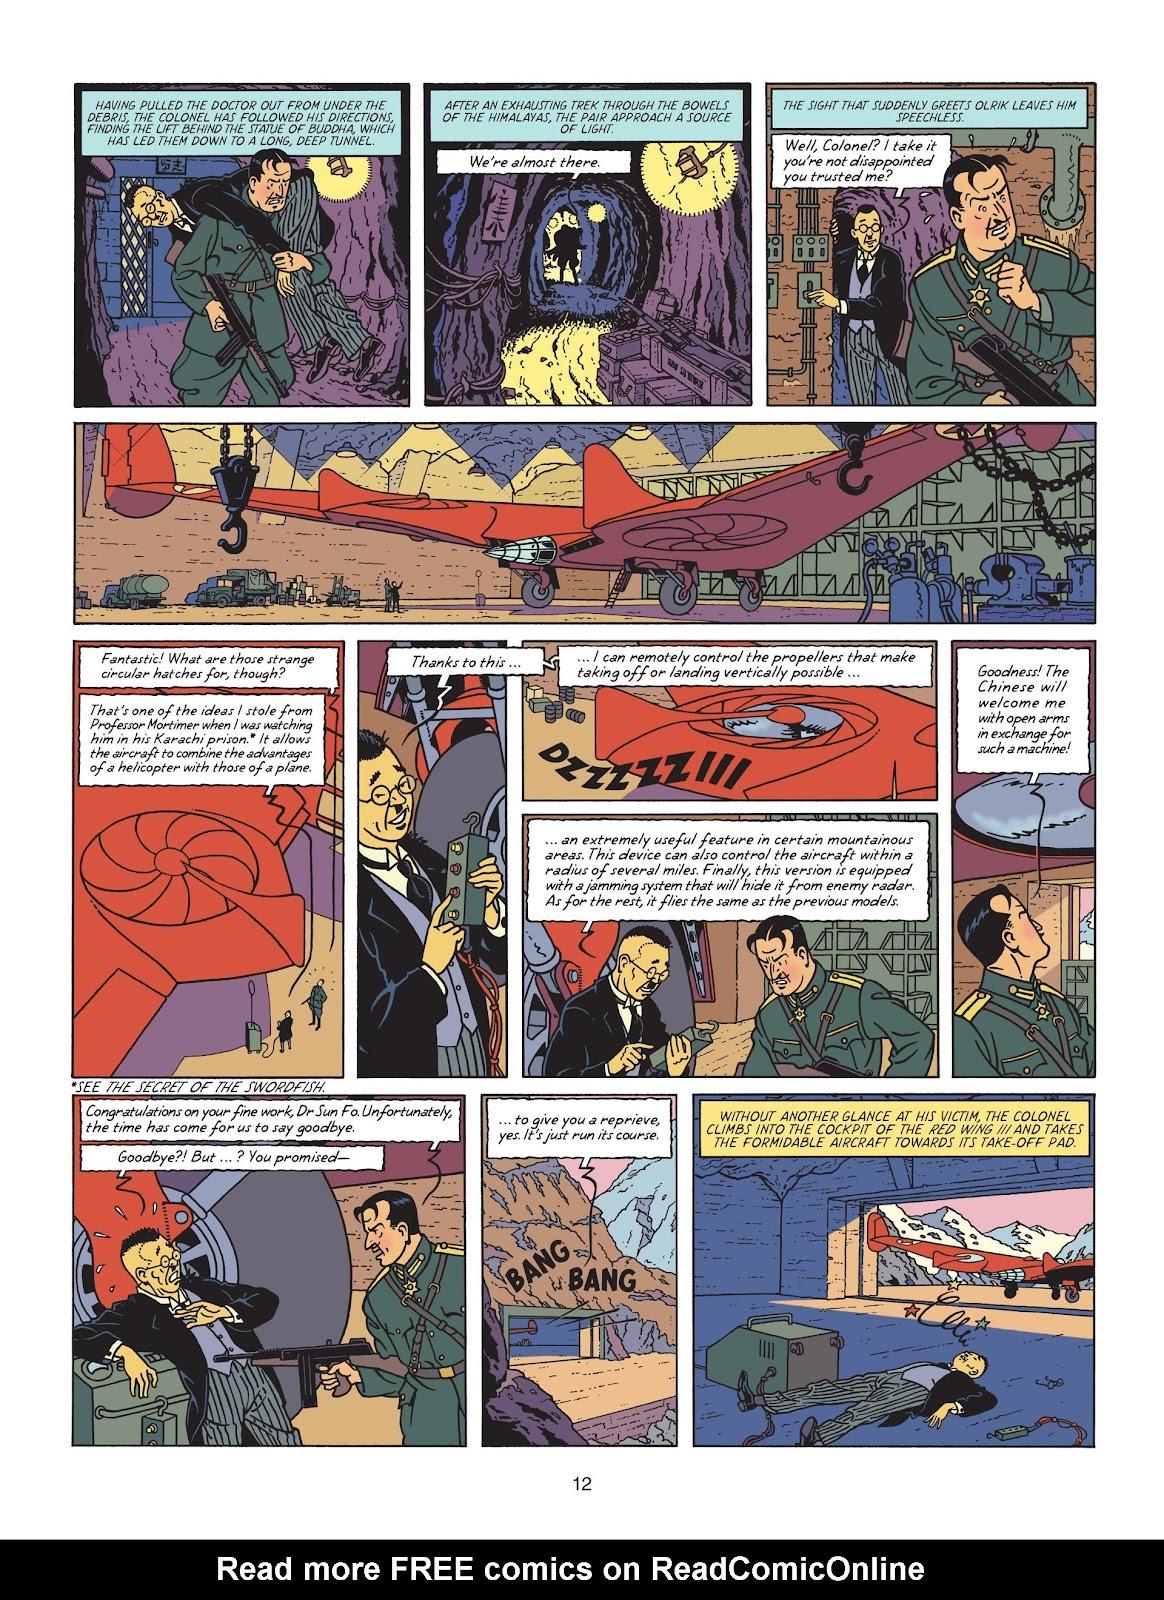 Read online Blake & Mortimer comic -  Issue #25 - 14